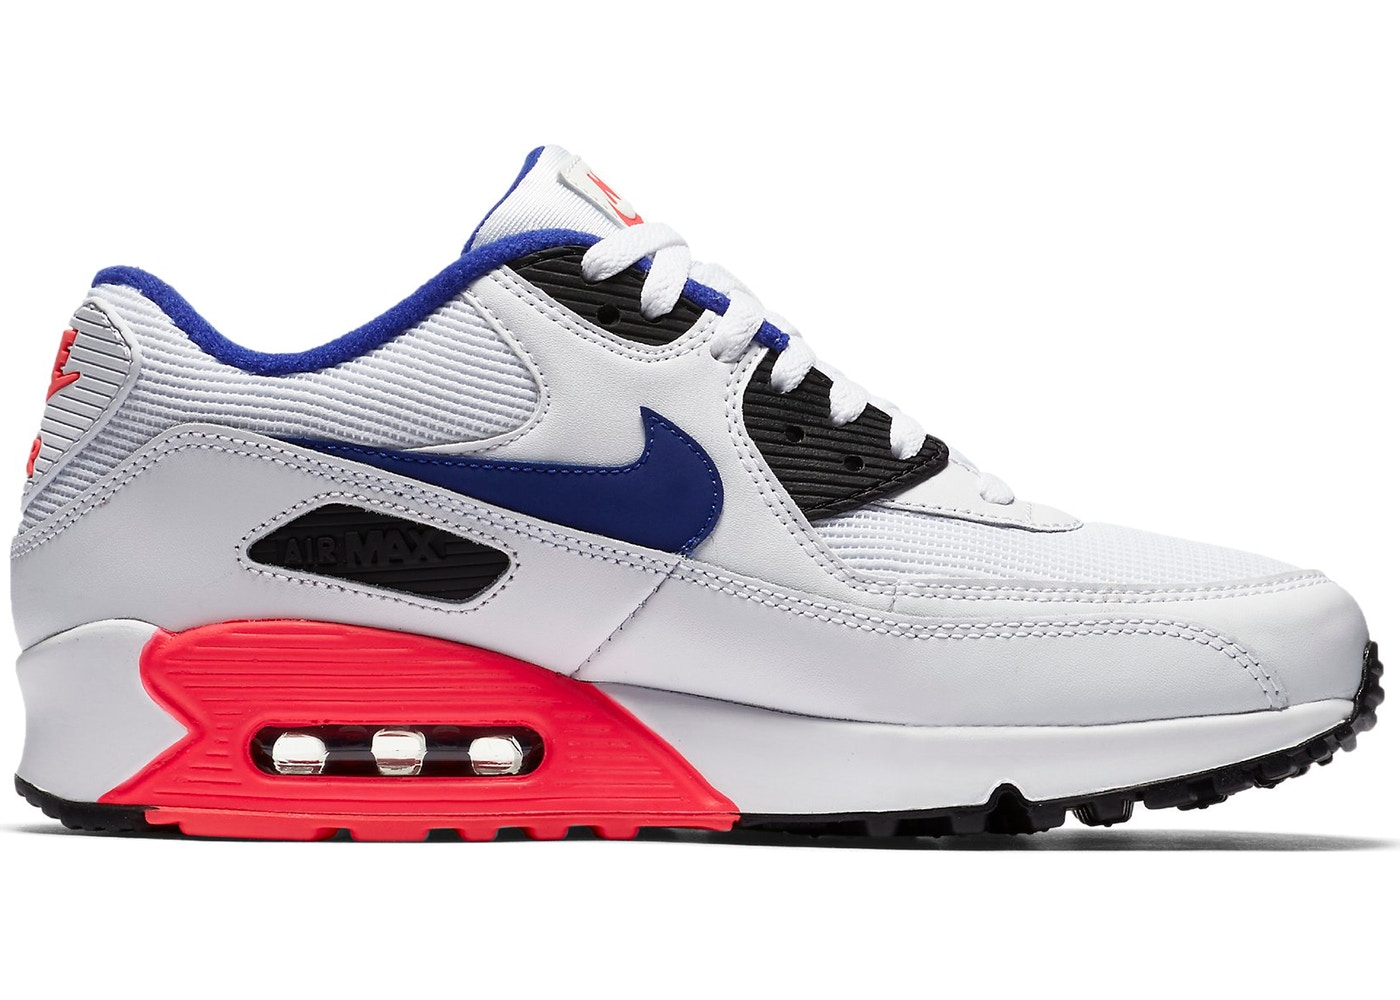 2181c23122b Buy Nike Air Max 90 Shoes   Deadstock Sneakers